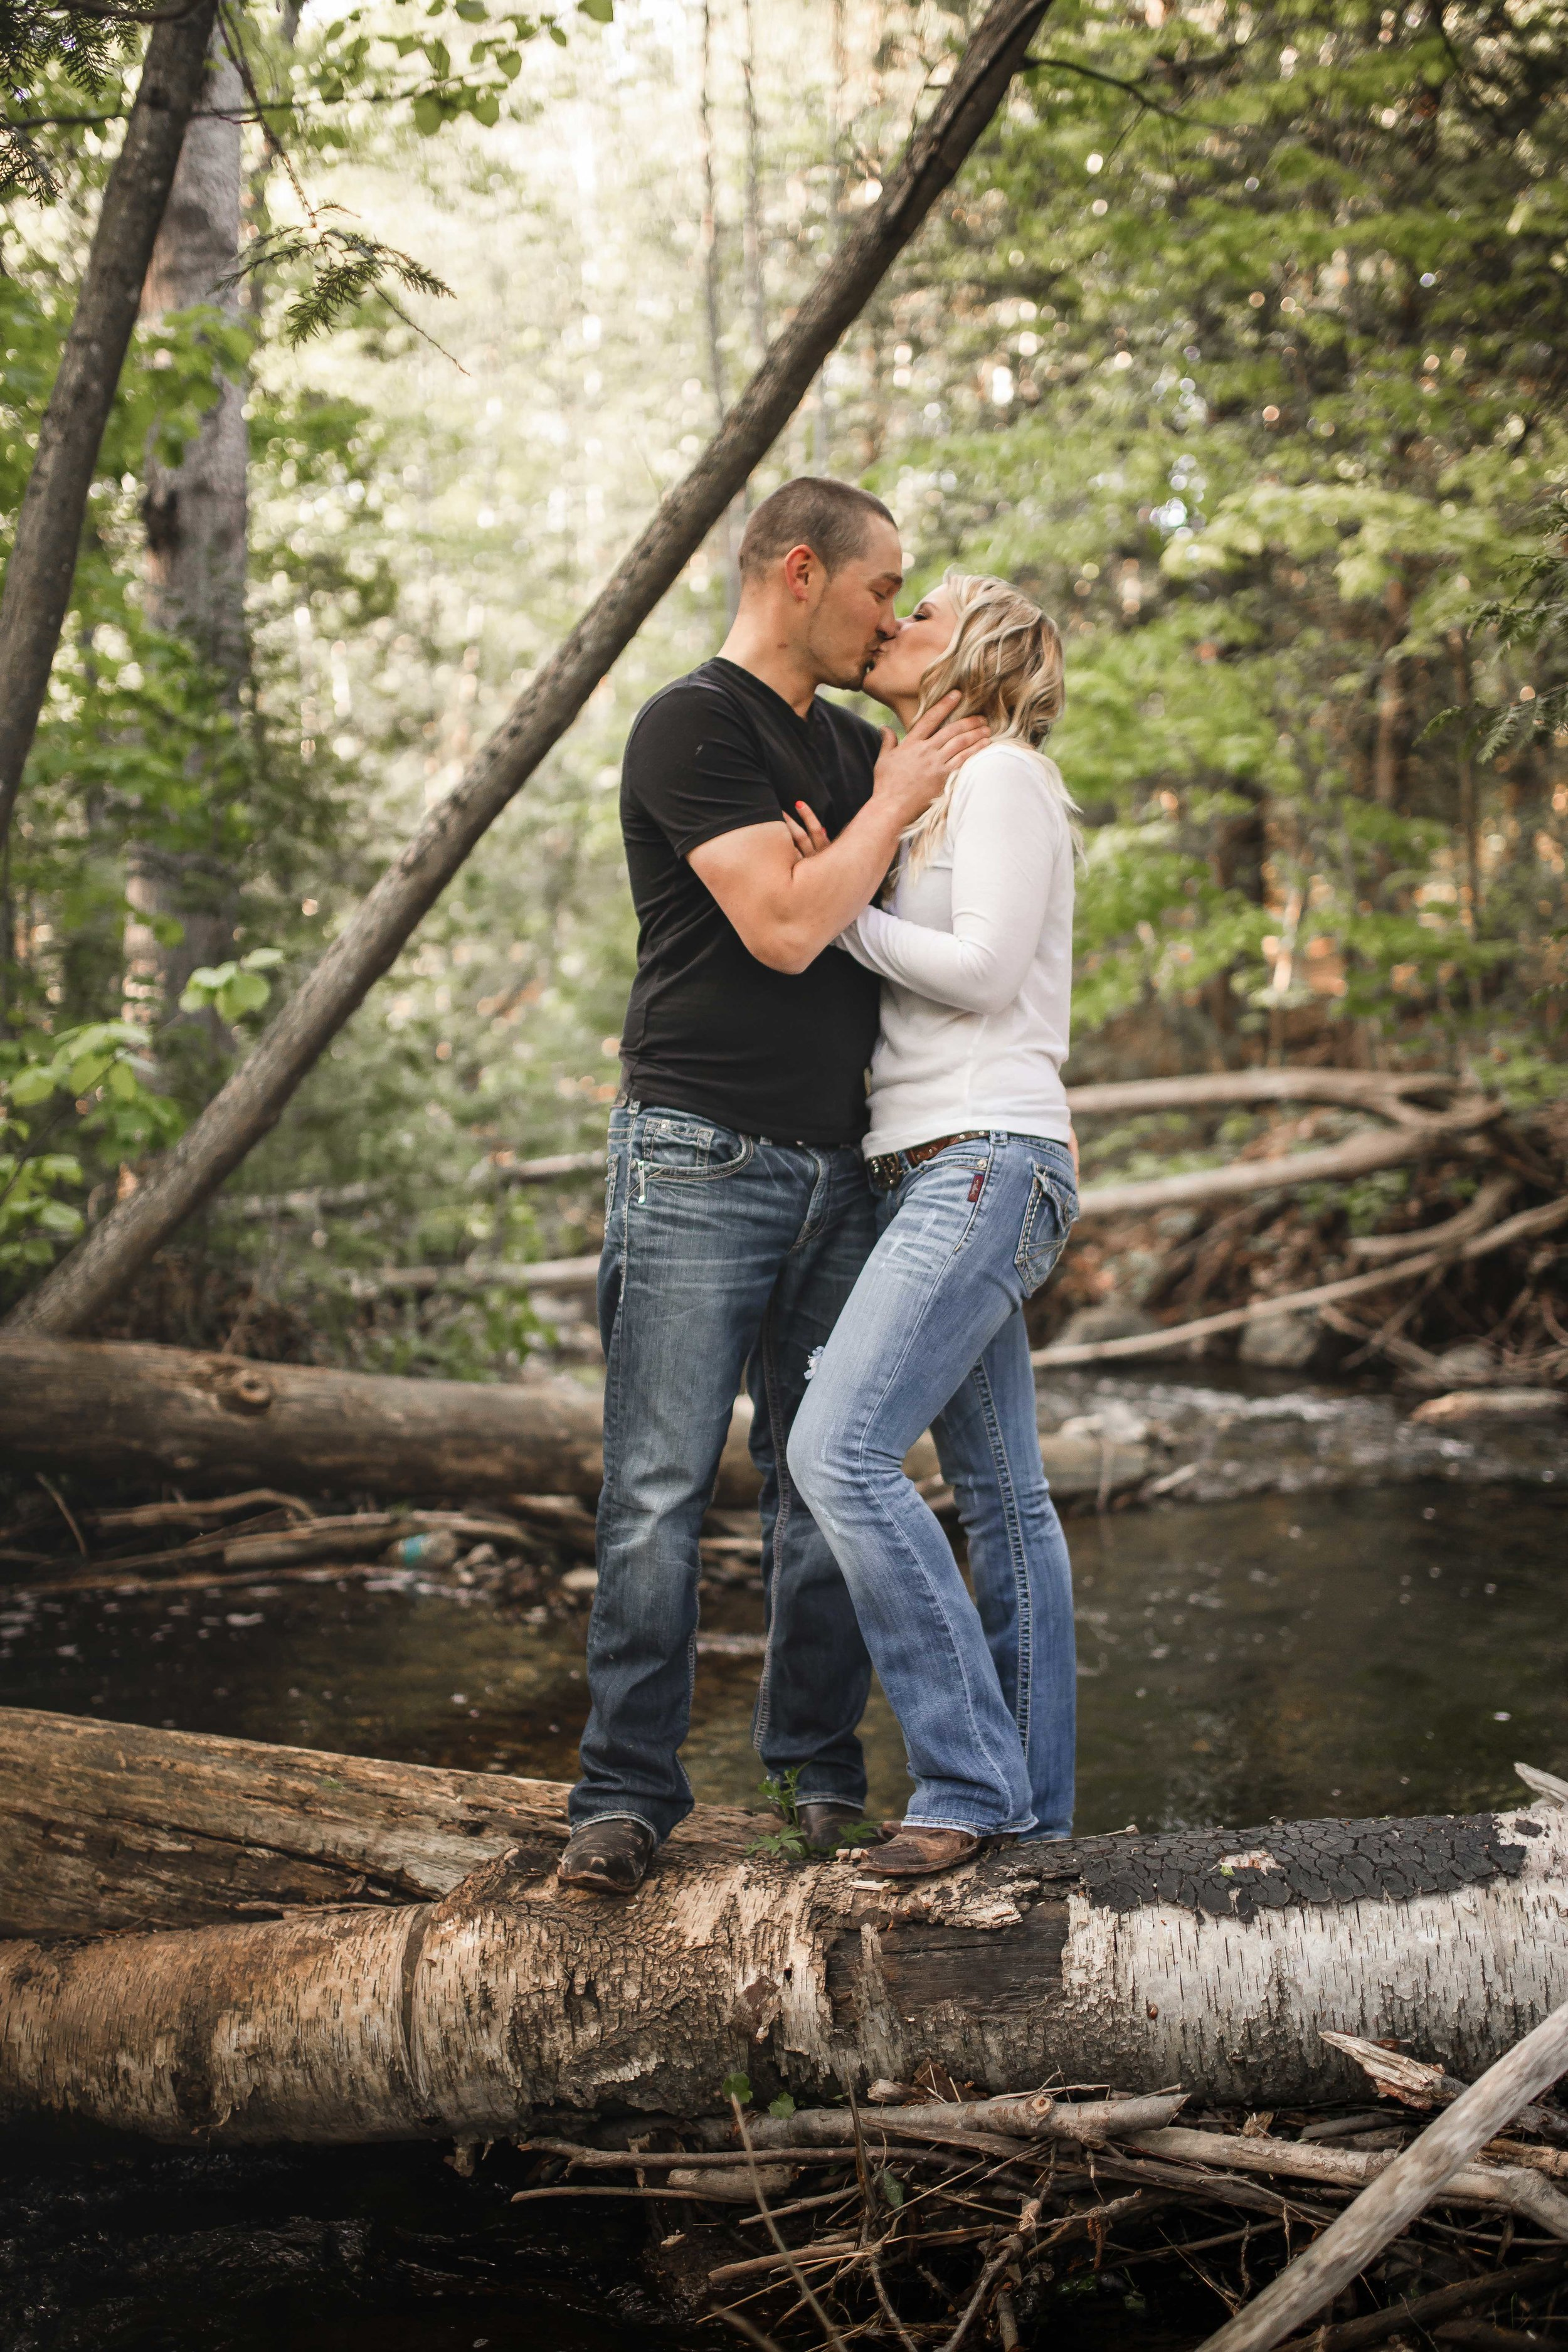 Amy-D-Photography--Wedding-Photography--Barrie-Wedding-Photography--Engagement-Session---Engagement-Pose-59.jpg